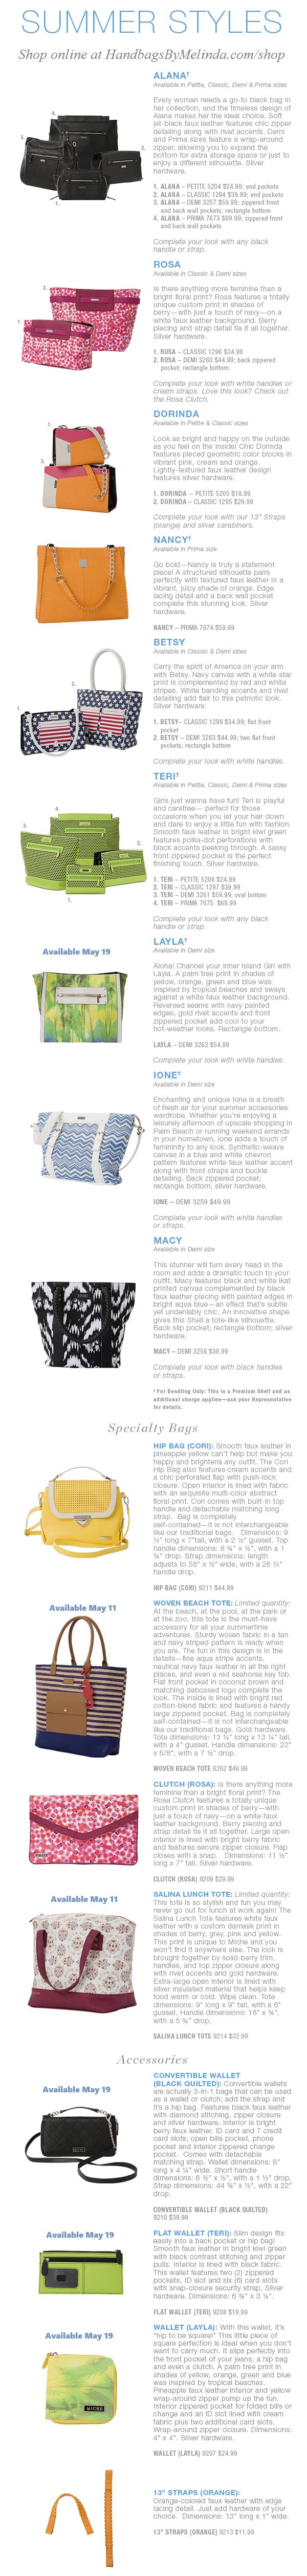 Presenting the Hot, New Miche Summer 2015 Collection! #handbags #michefashion #summerfashion